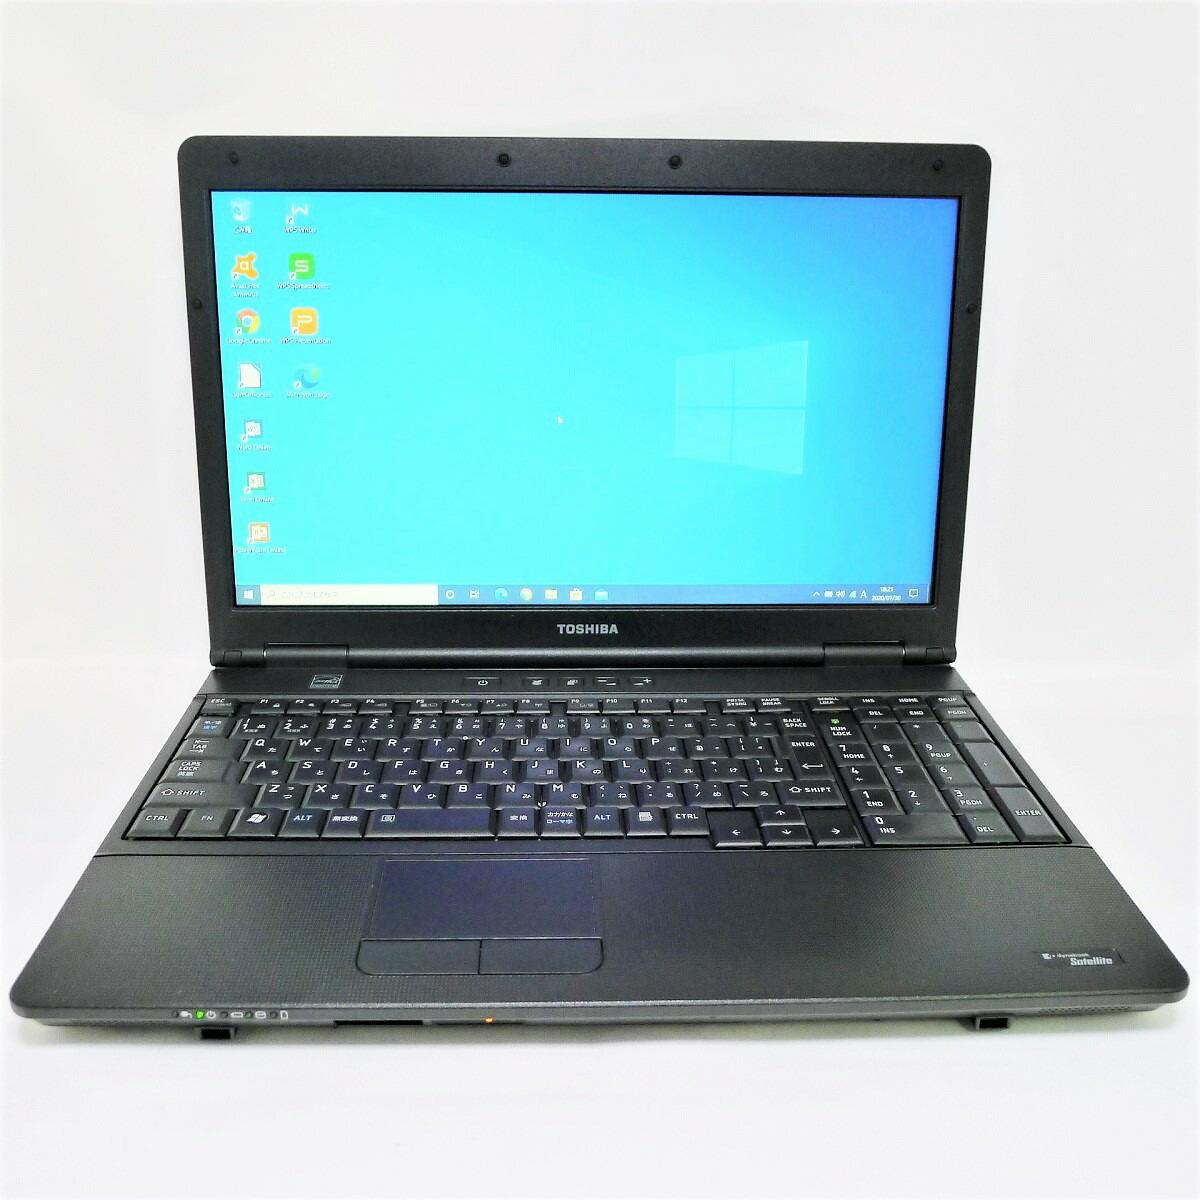 TOSHIBA dynabook Satellite B552 Celeron 定番キャンバス 16GB 新品HDD1TB スーパーマルチ 64bitWPSOffice テンキーあり ノートパソコン 100%品質保証 無線LAN Windows10 15.6インチ 中古 中古パソコン